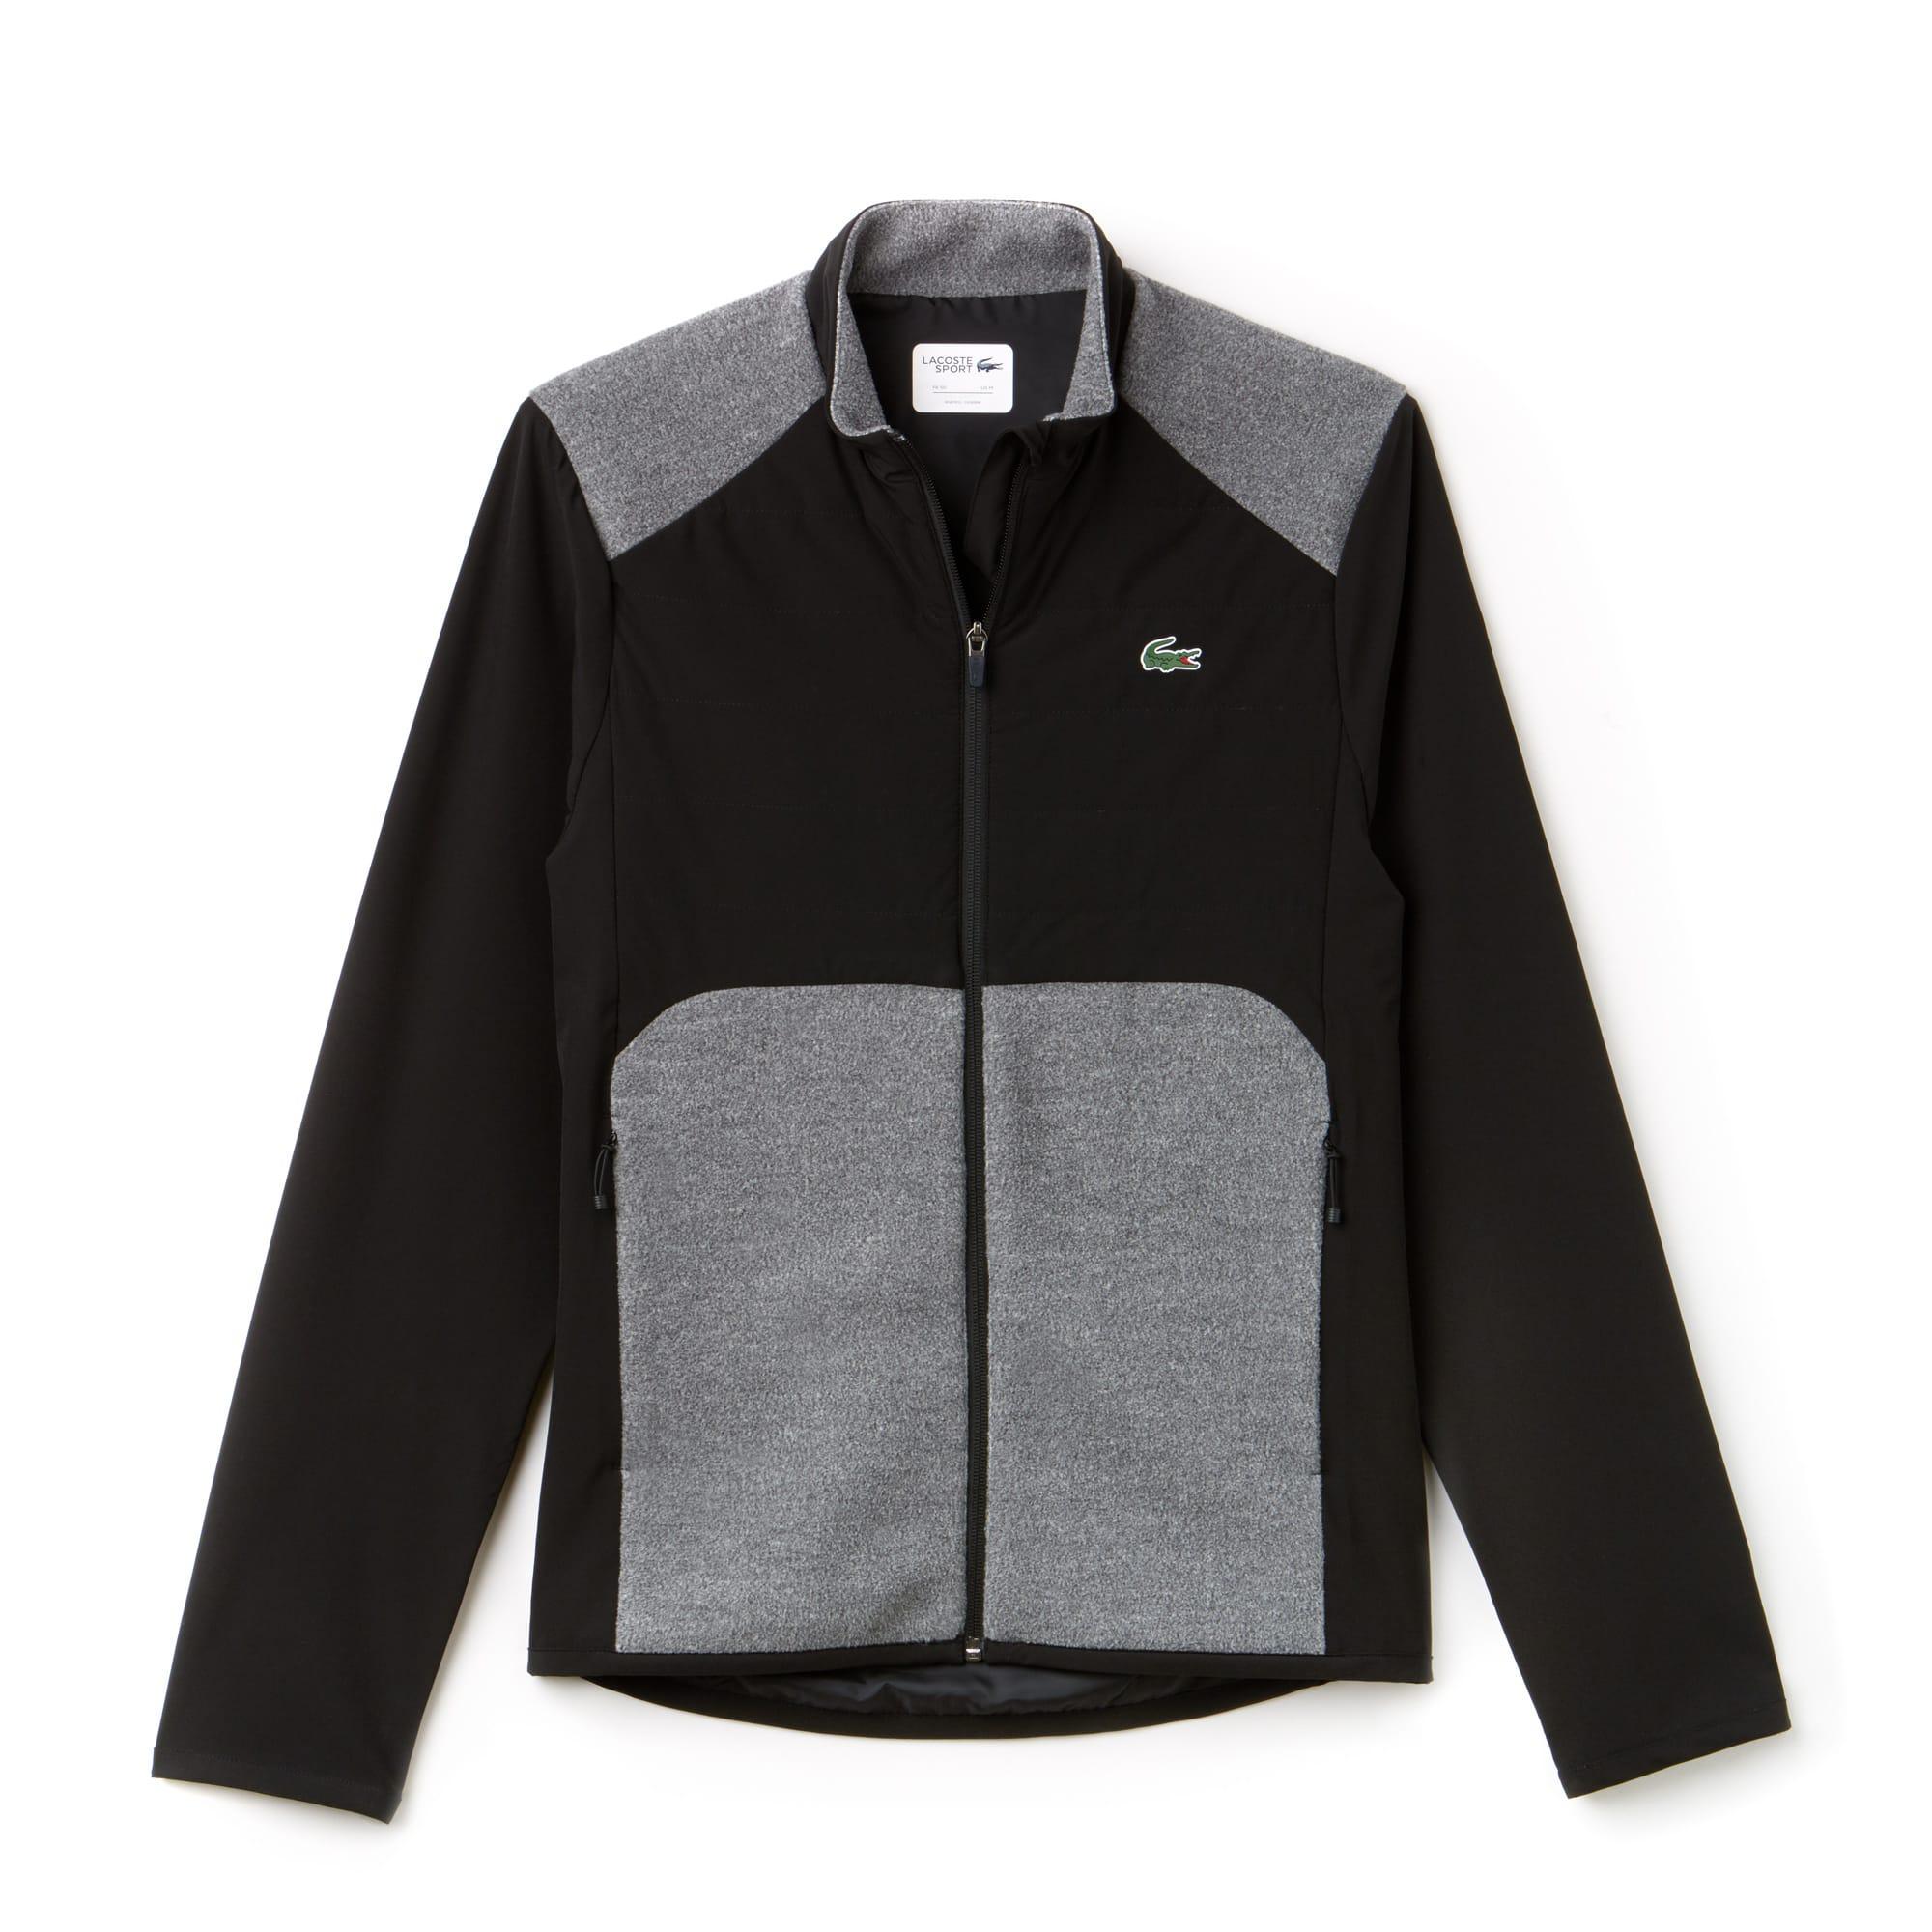 bad5fe9ac670 Men s Jackets and Coats